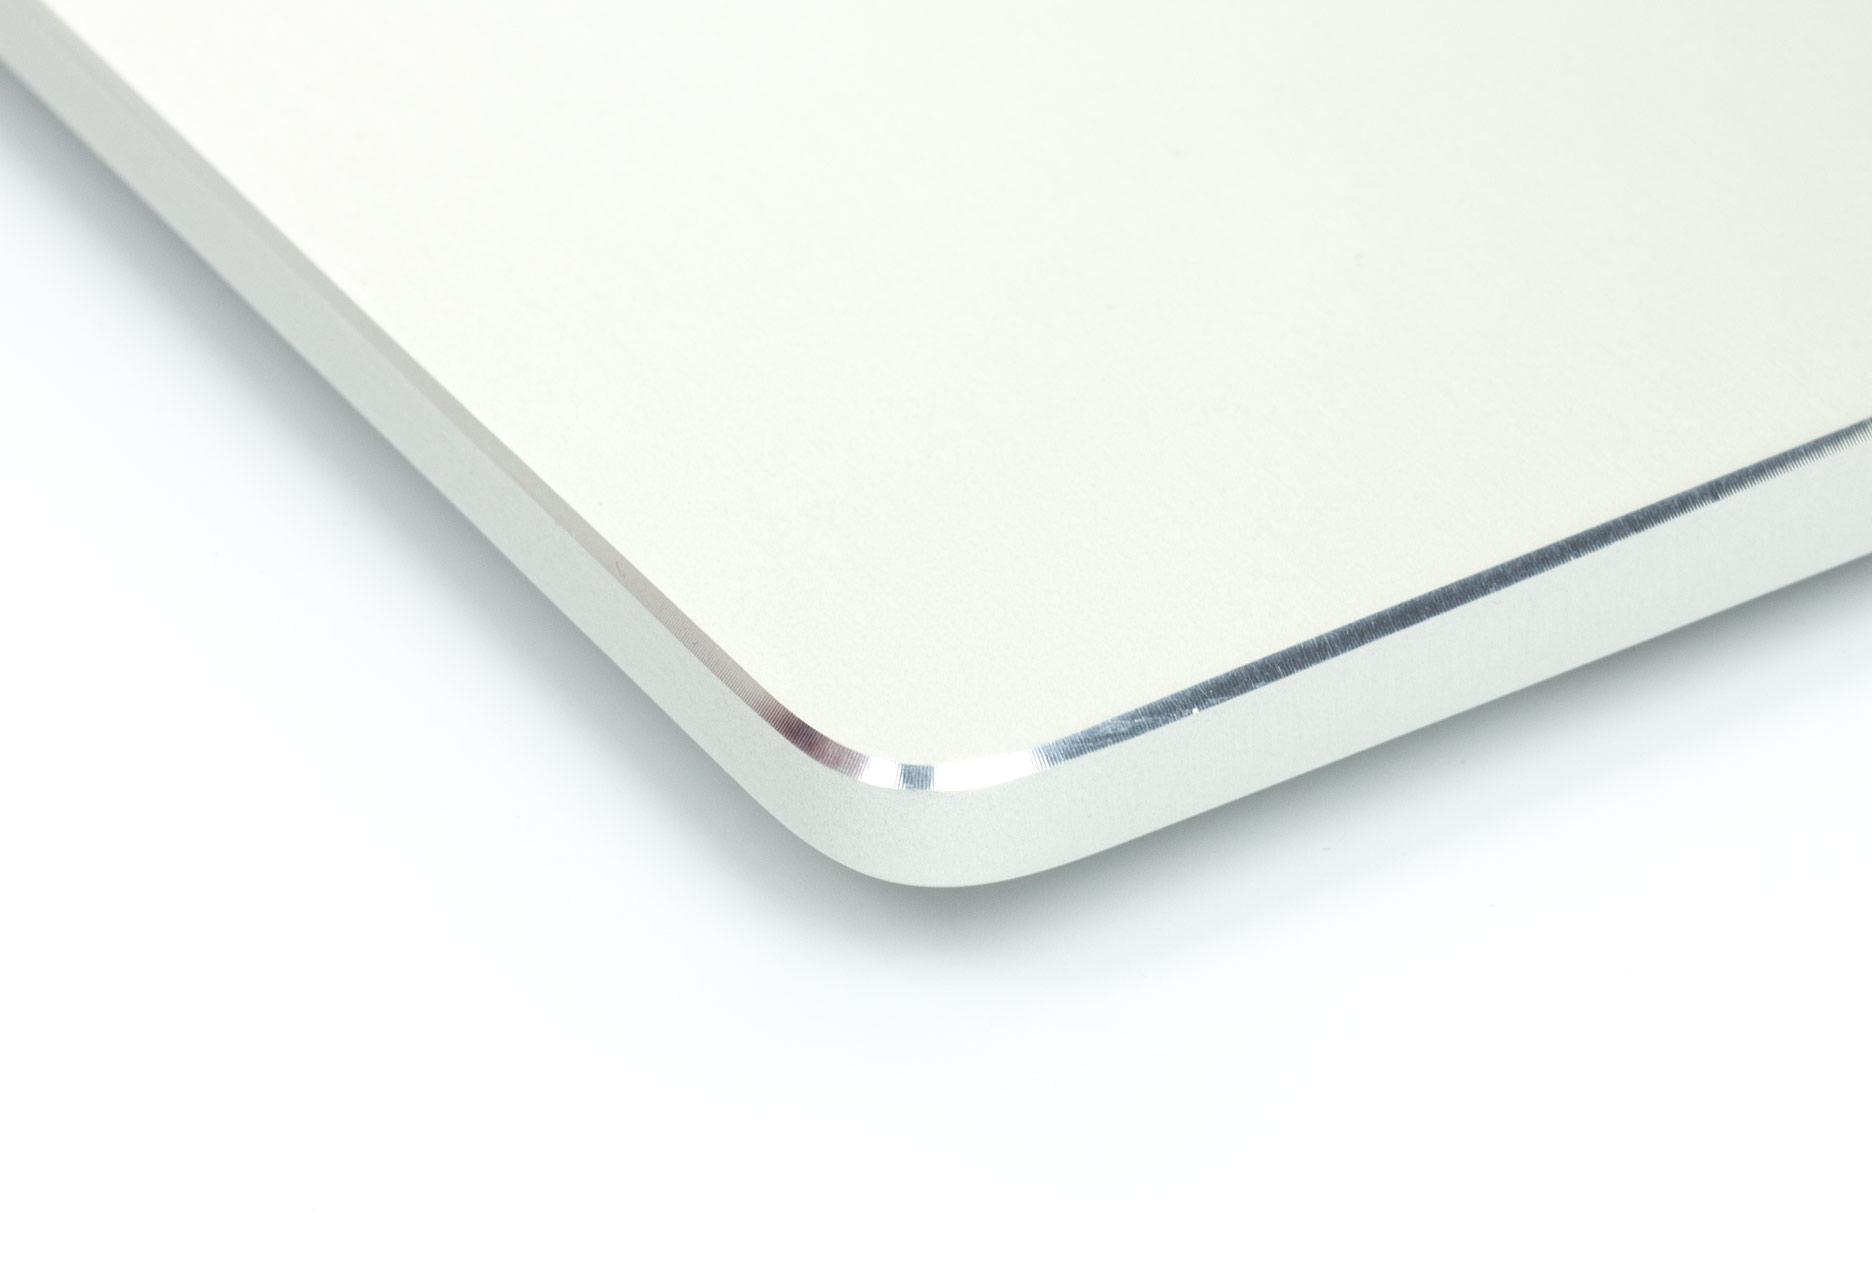 Asus Zenbook Pro UX501 krawędź